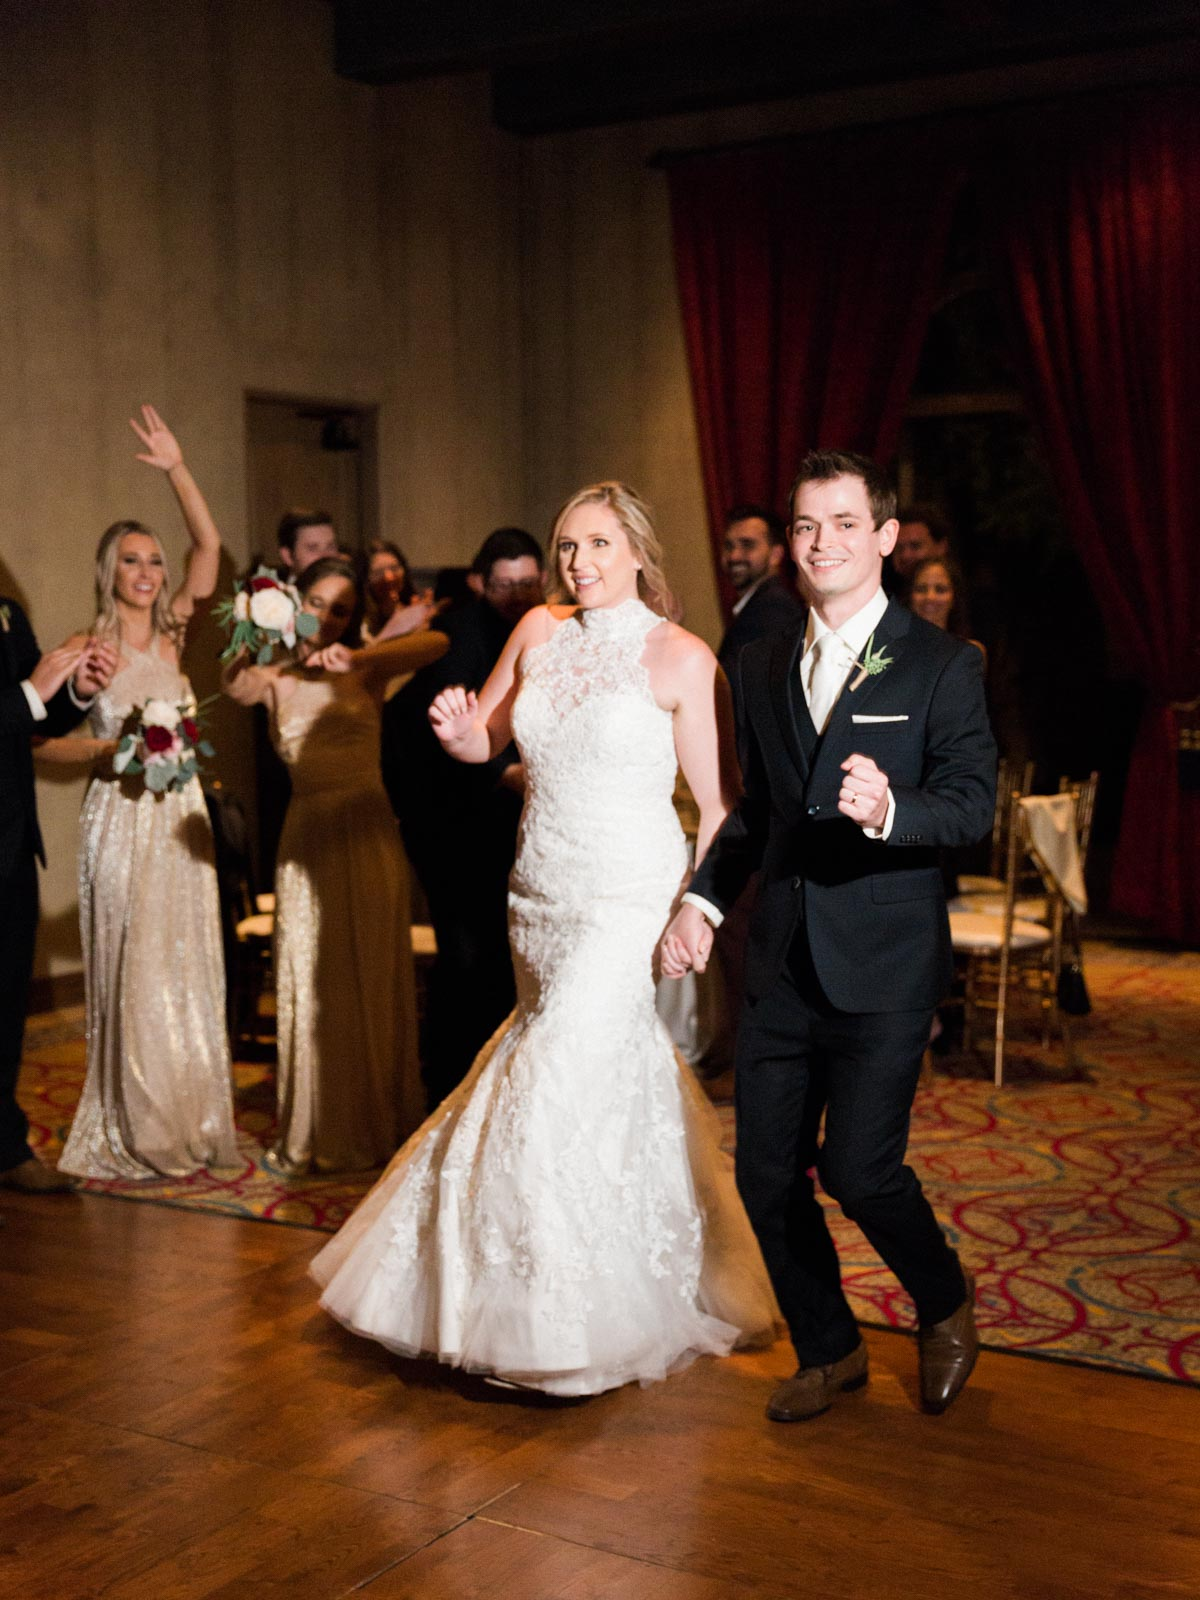 grand-entrance-wedding.jpg